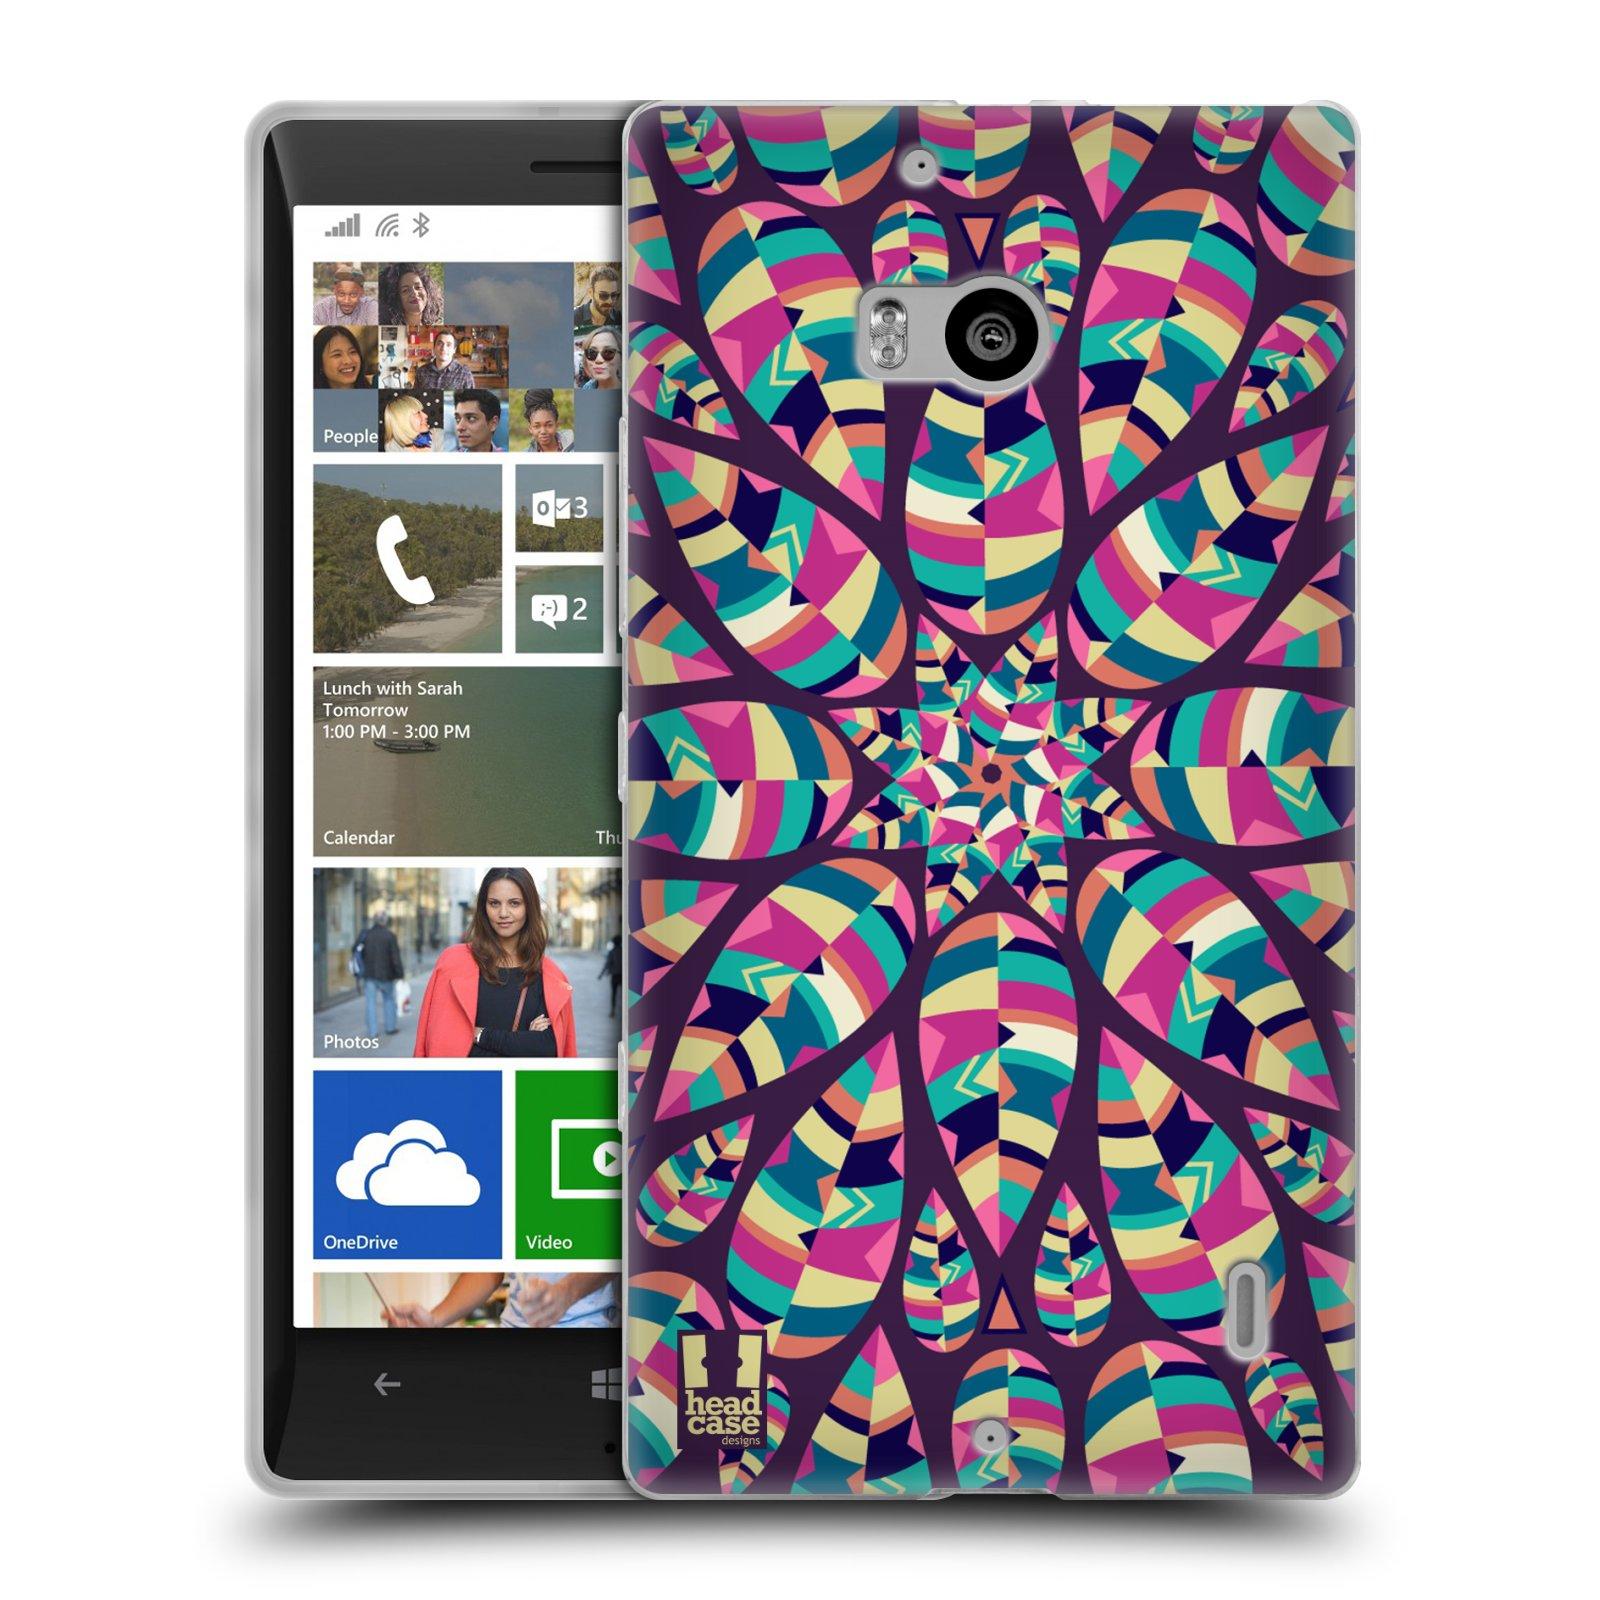 Silikonové pouzdro na mobil Nokia Lumia 930 HEAD CASE Shine (Silikonový kryt či obal na mobilní telefon Nokia Lumia 930)